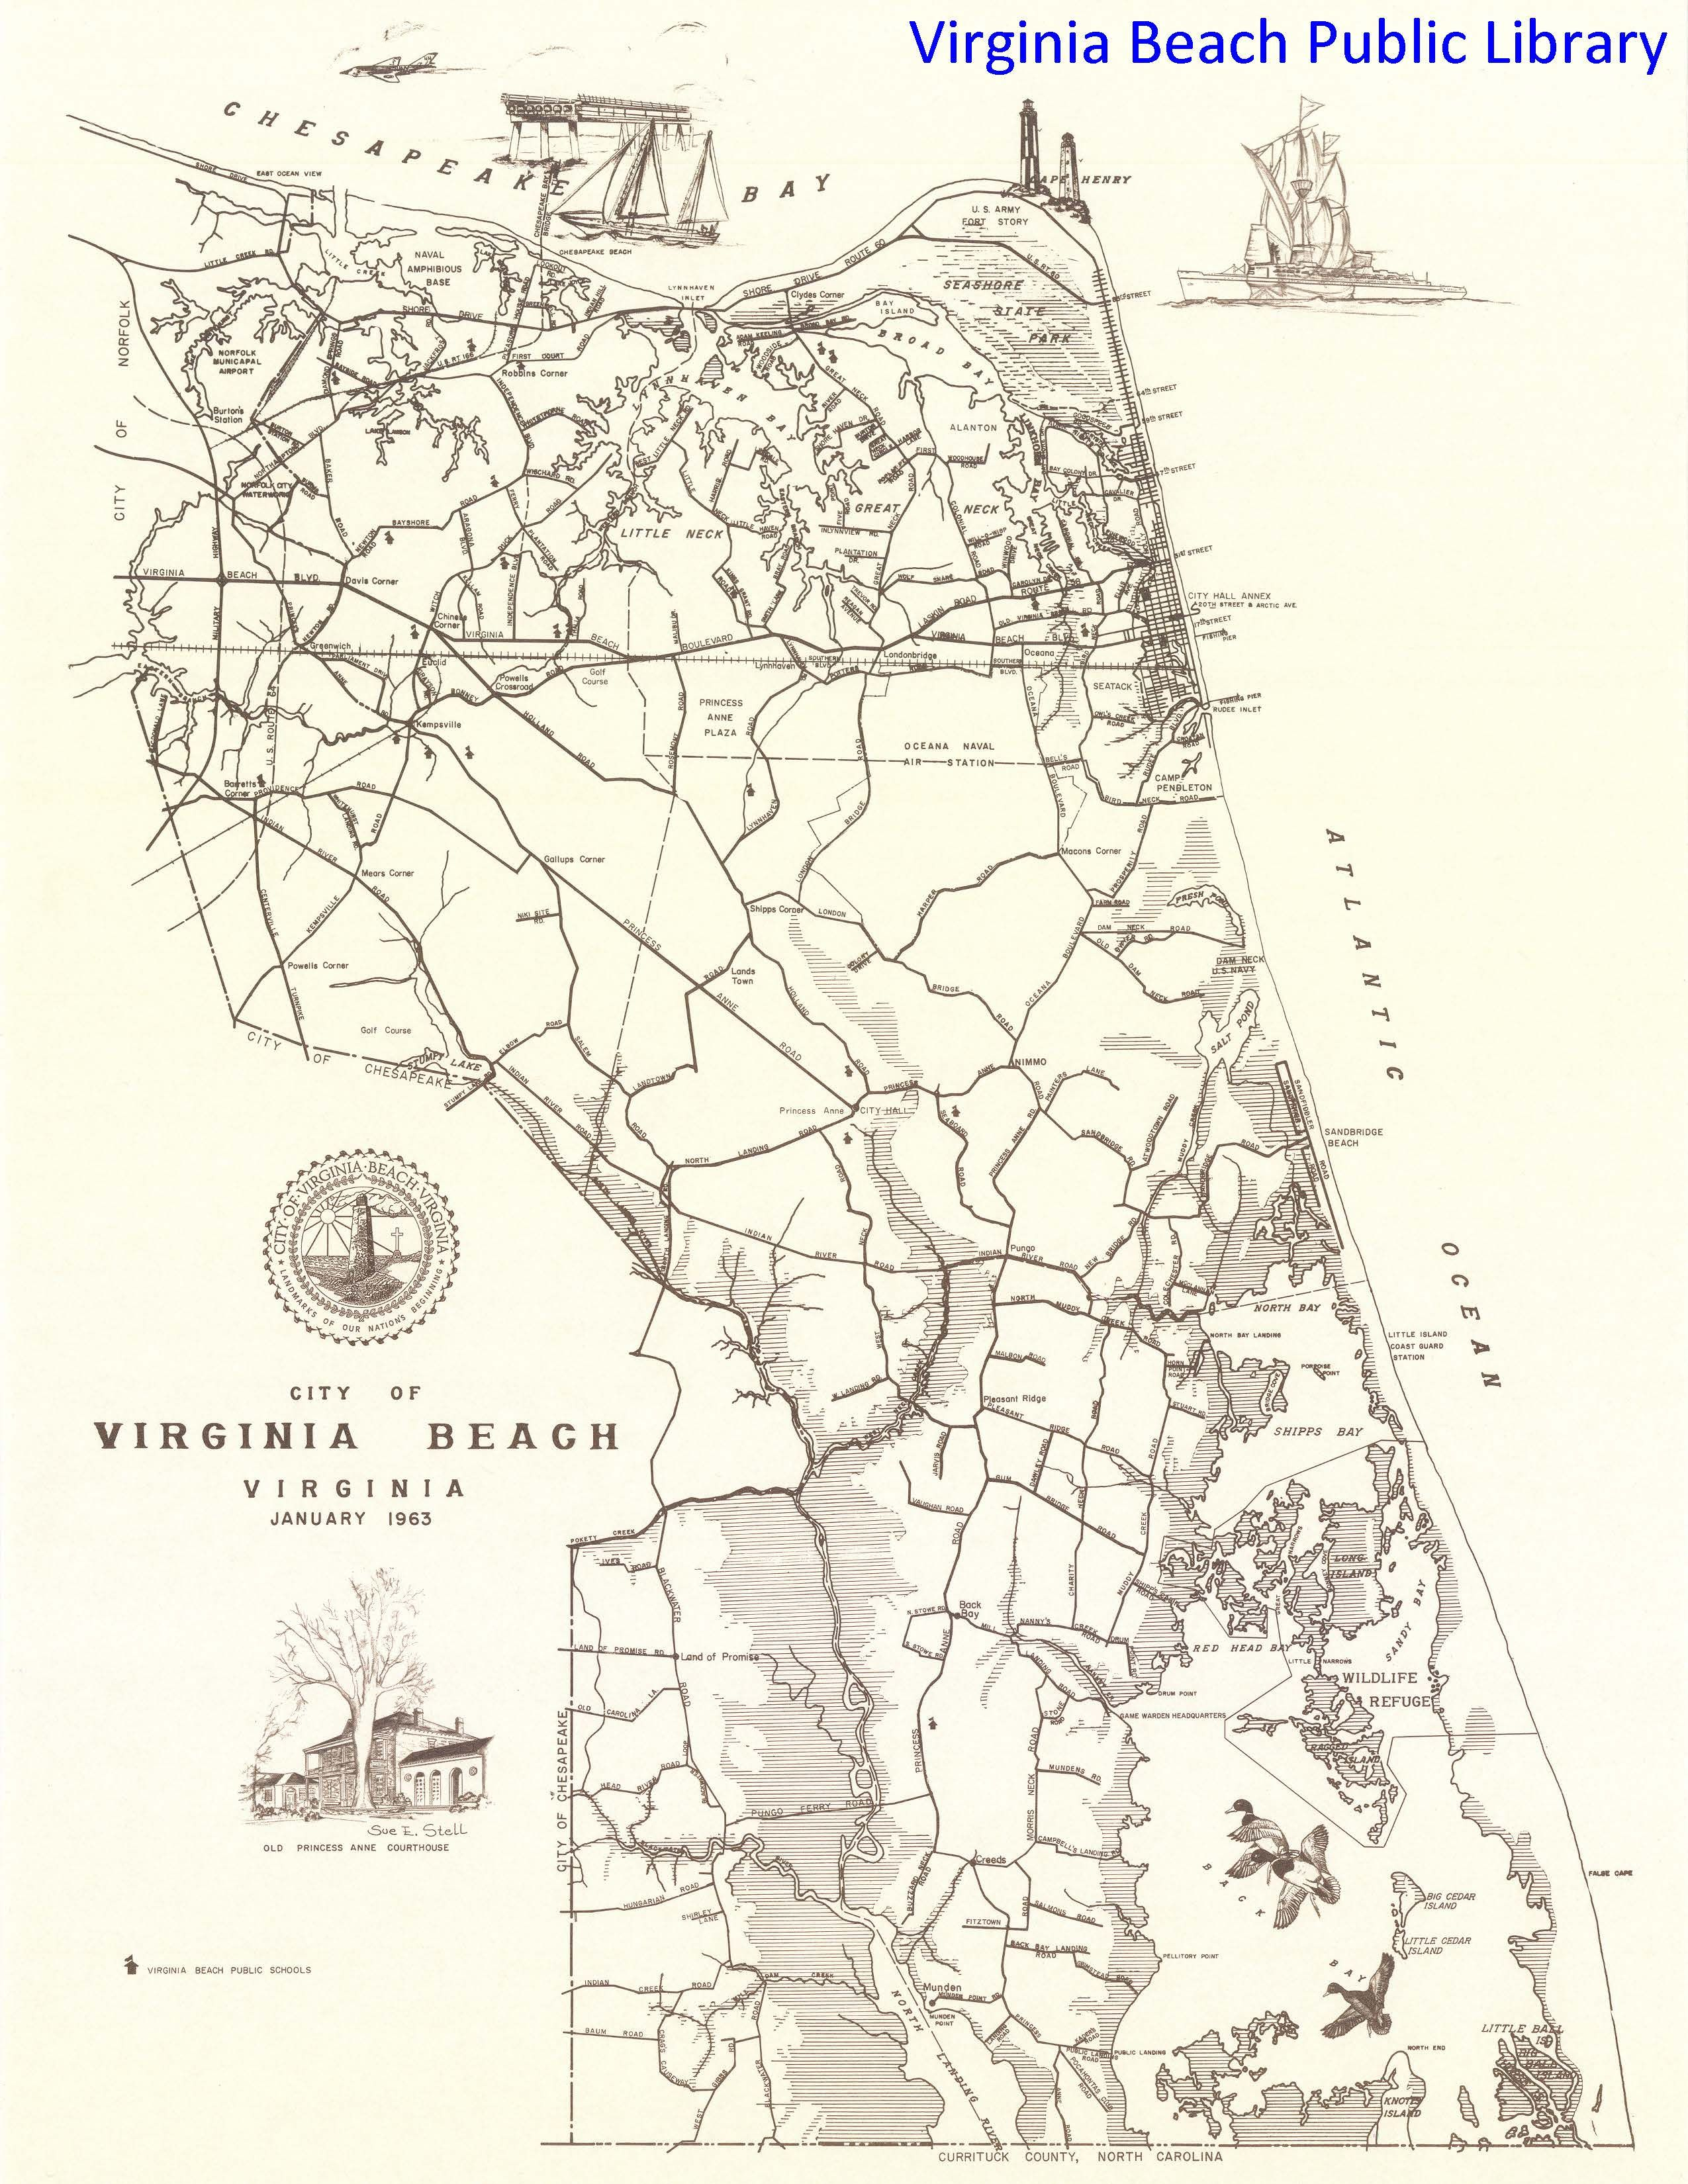 A map of Virginia Beach Virginia in 1963 when Princess Anne County